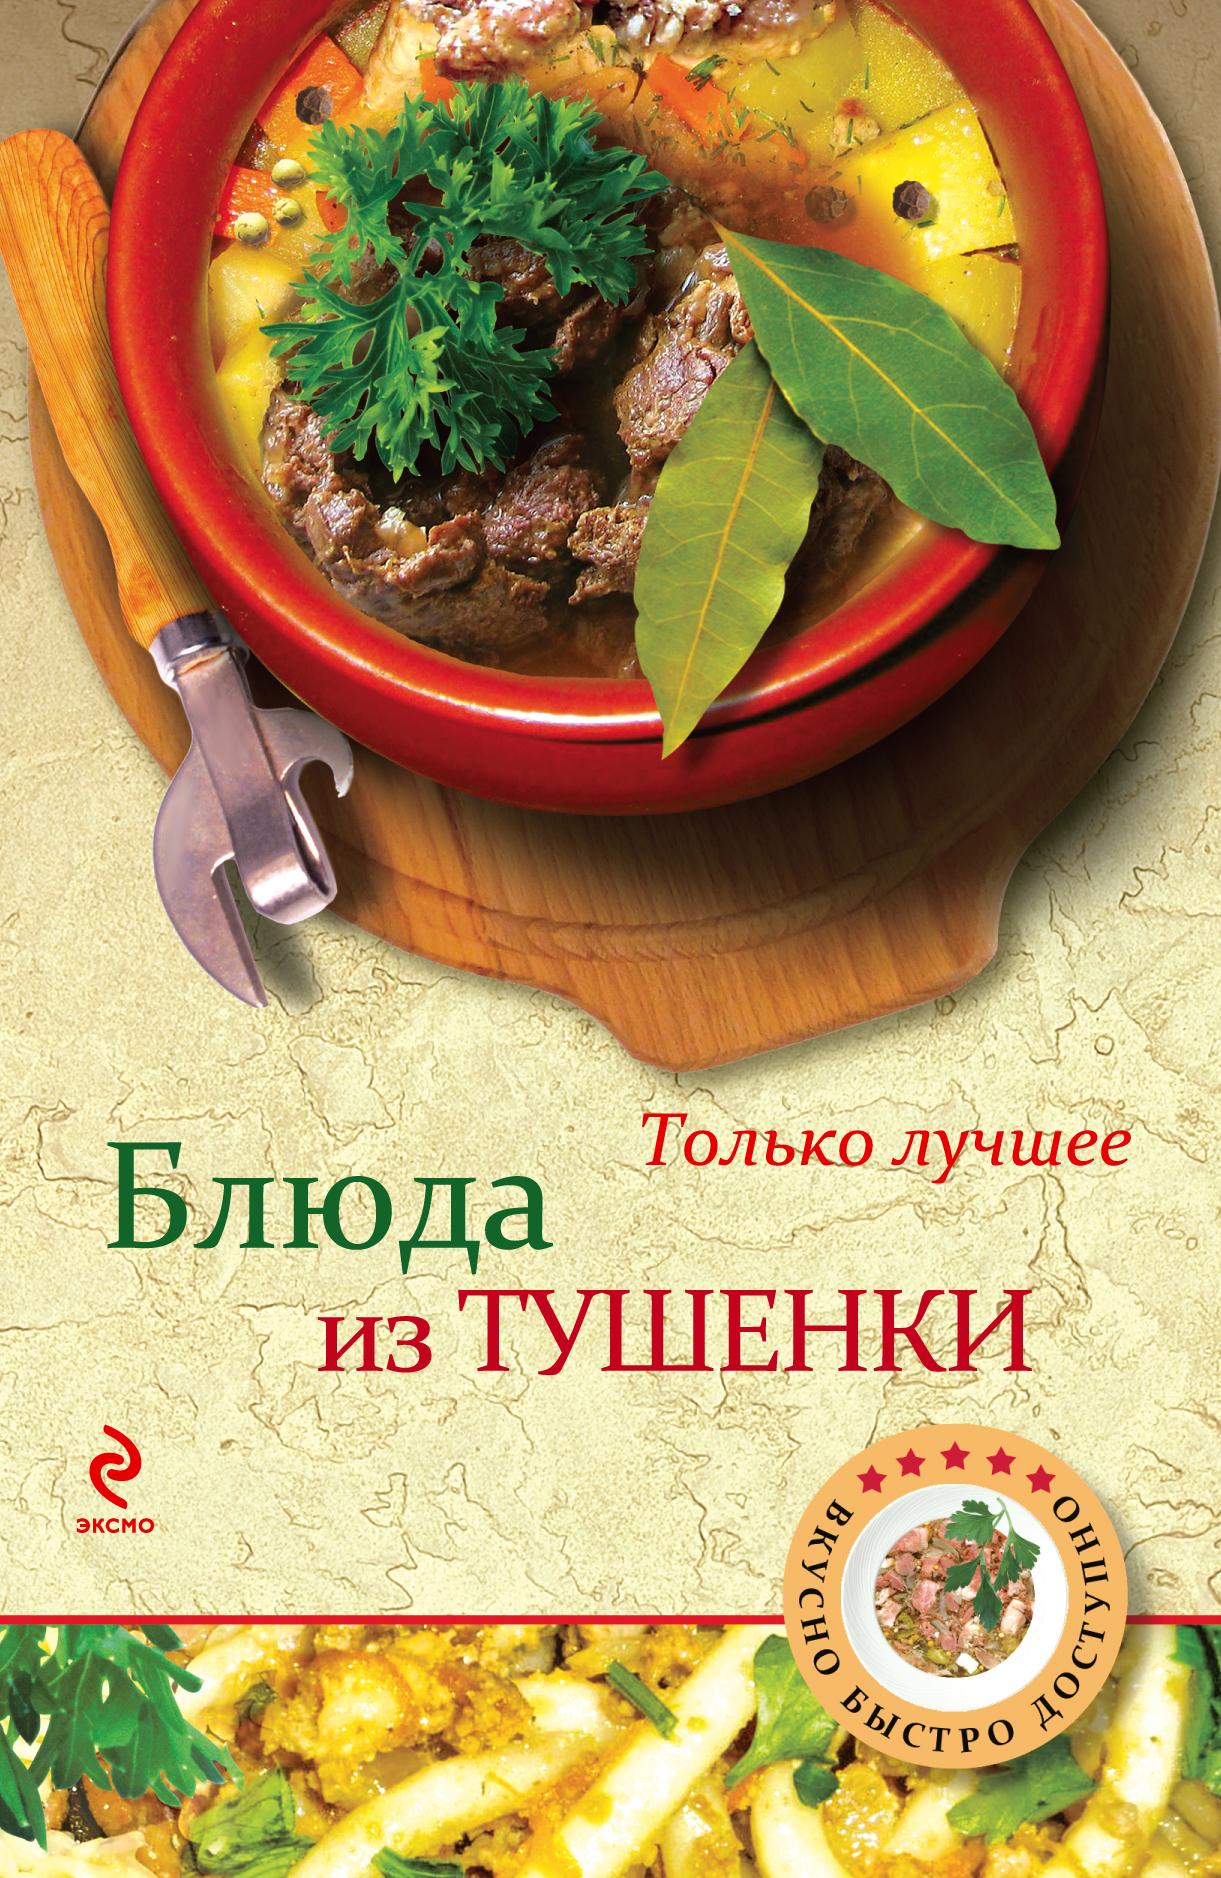 Блюда из тушенки рецепты